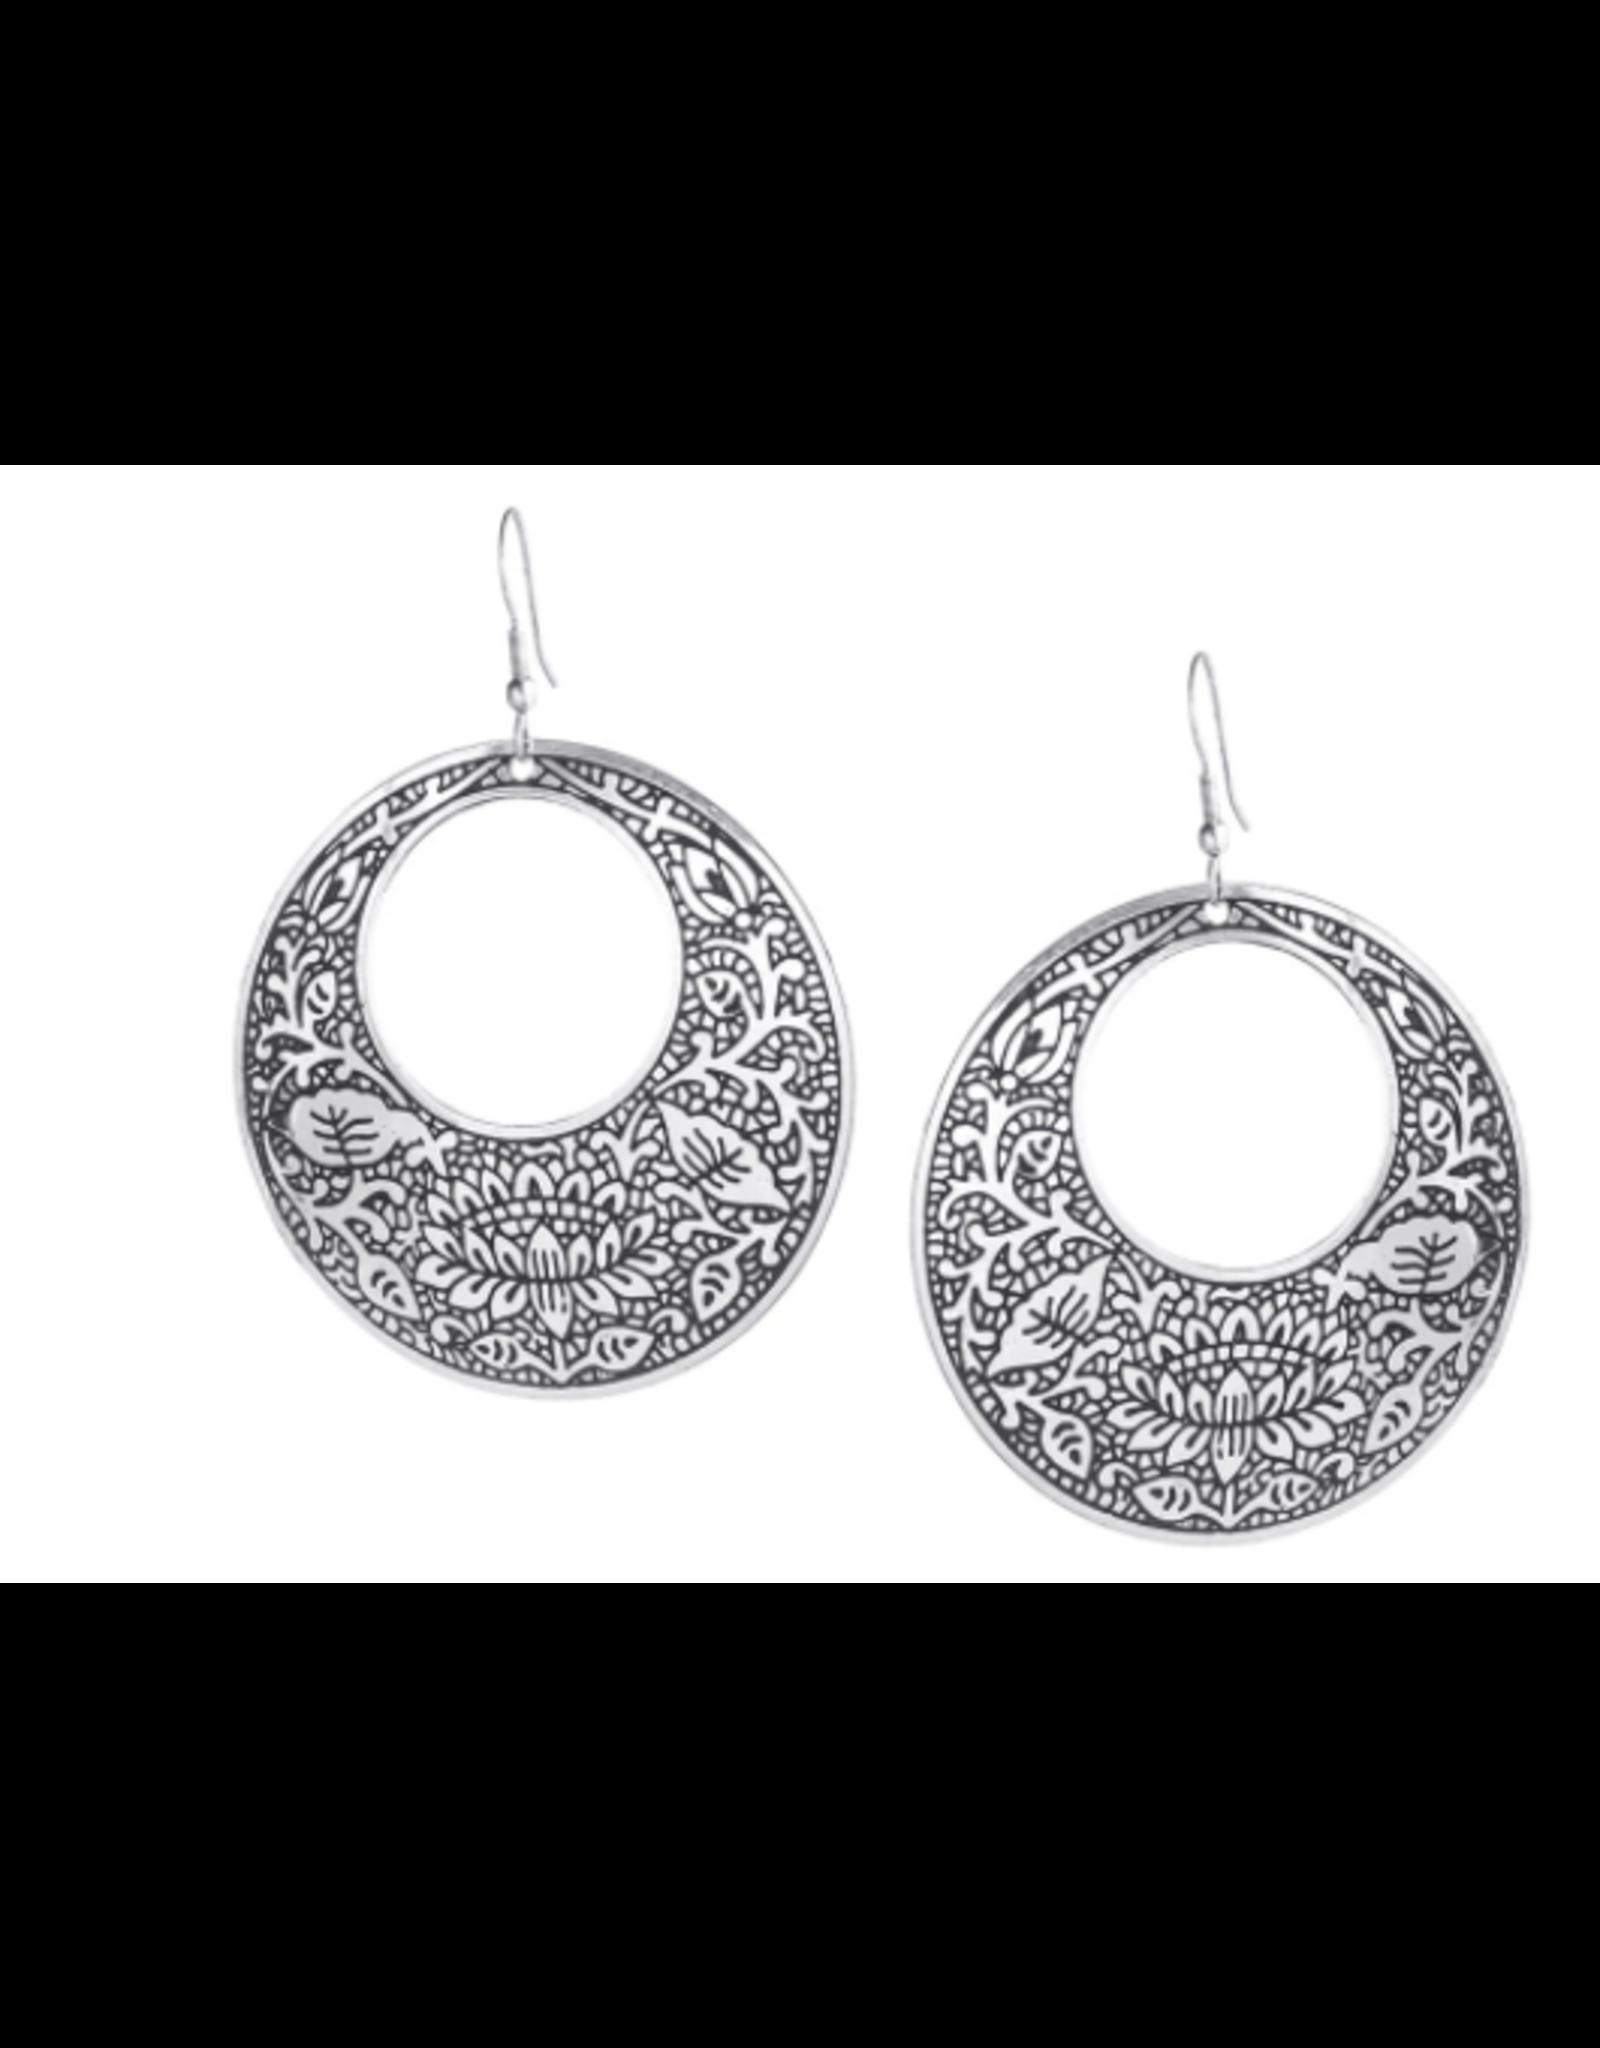 Metal Impression Earrings, India